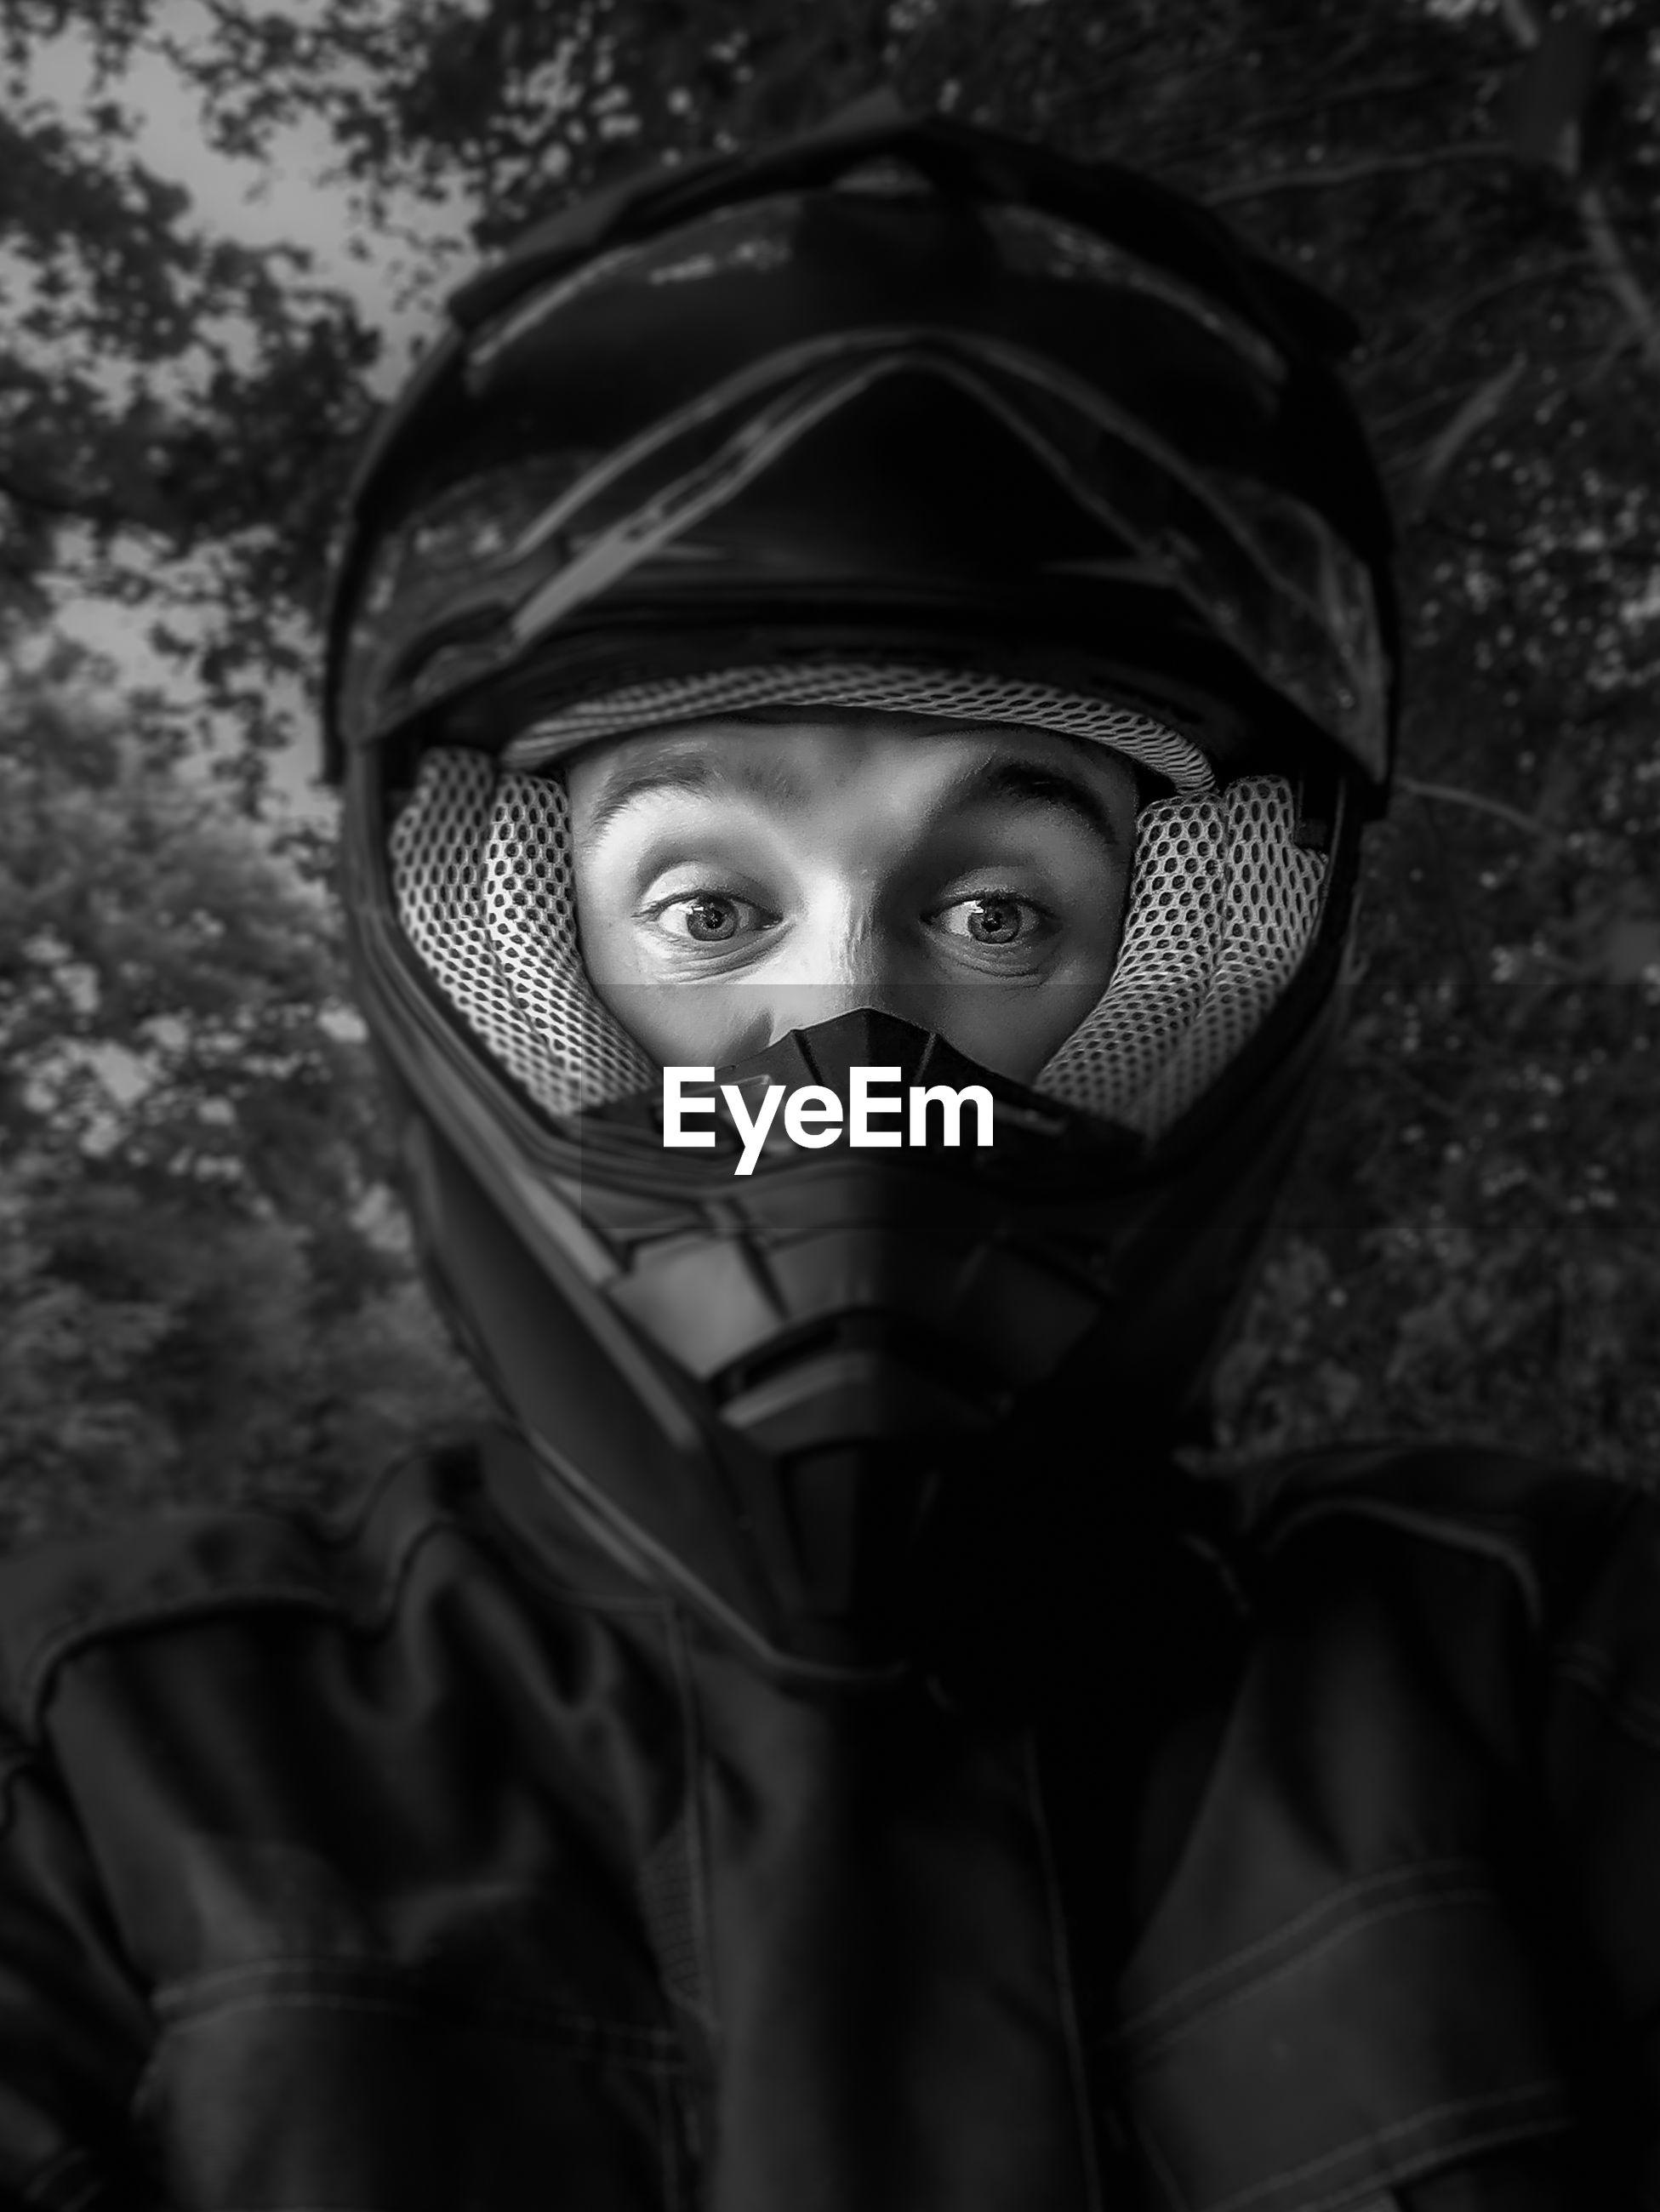 Close-up portrait of person wearing helmet